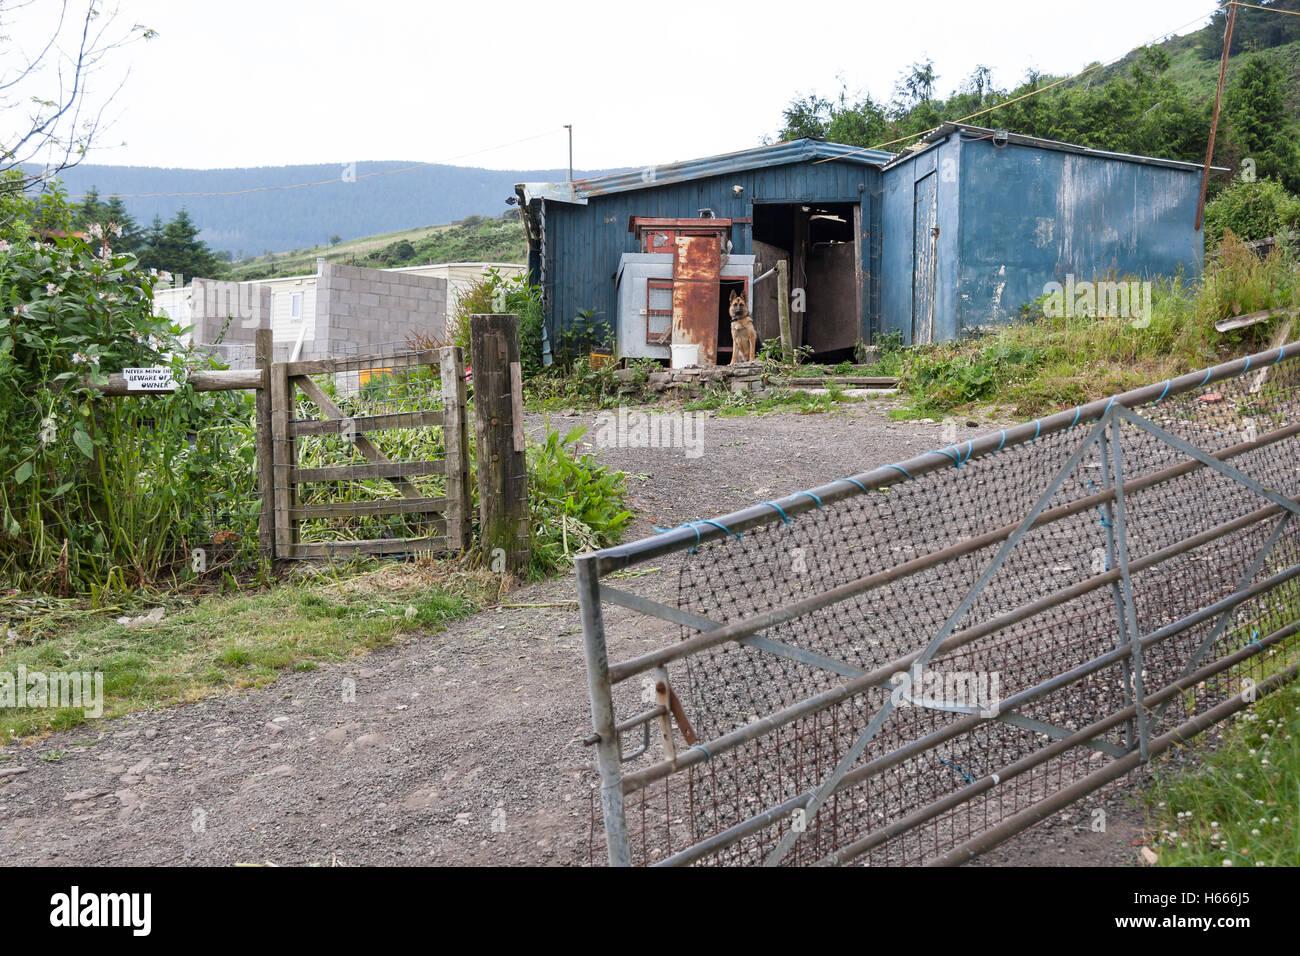 German Shepherd dog guarding shed - Stock Image